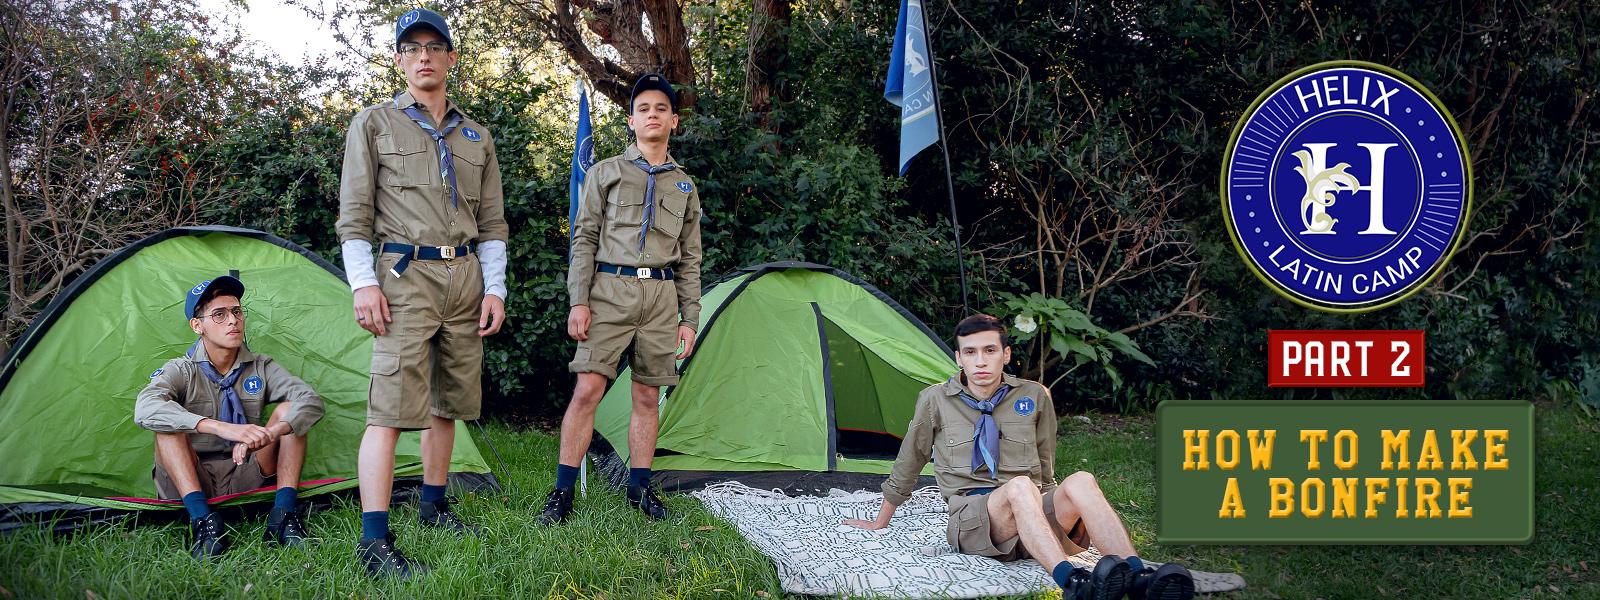 Helix Latin Camp | Part 2: How to Make a Bonfire